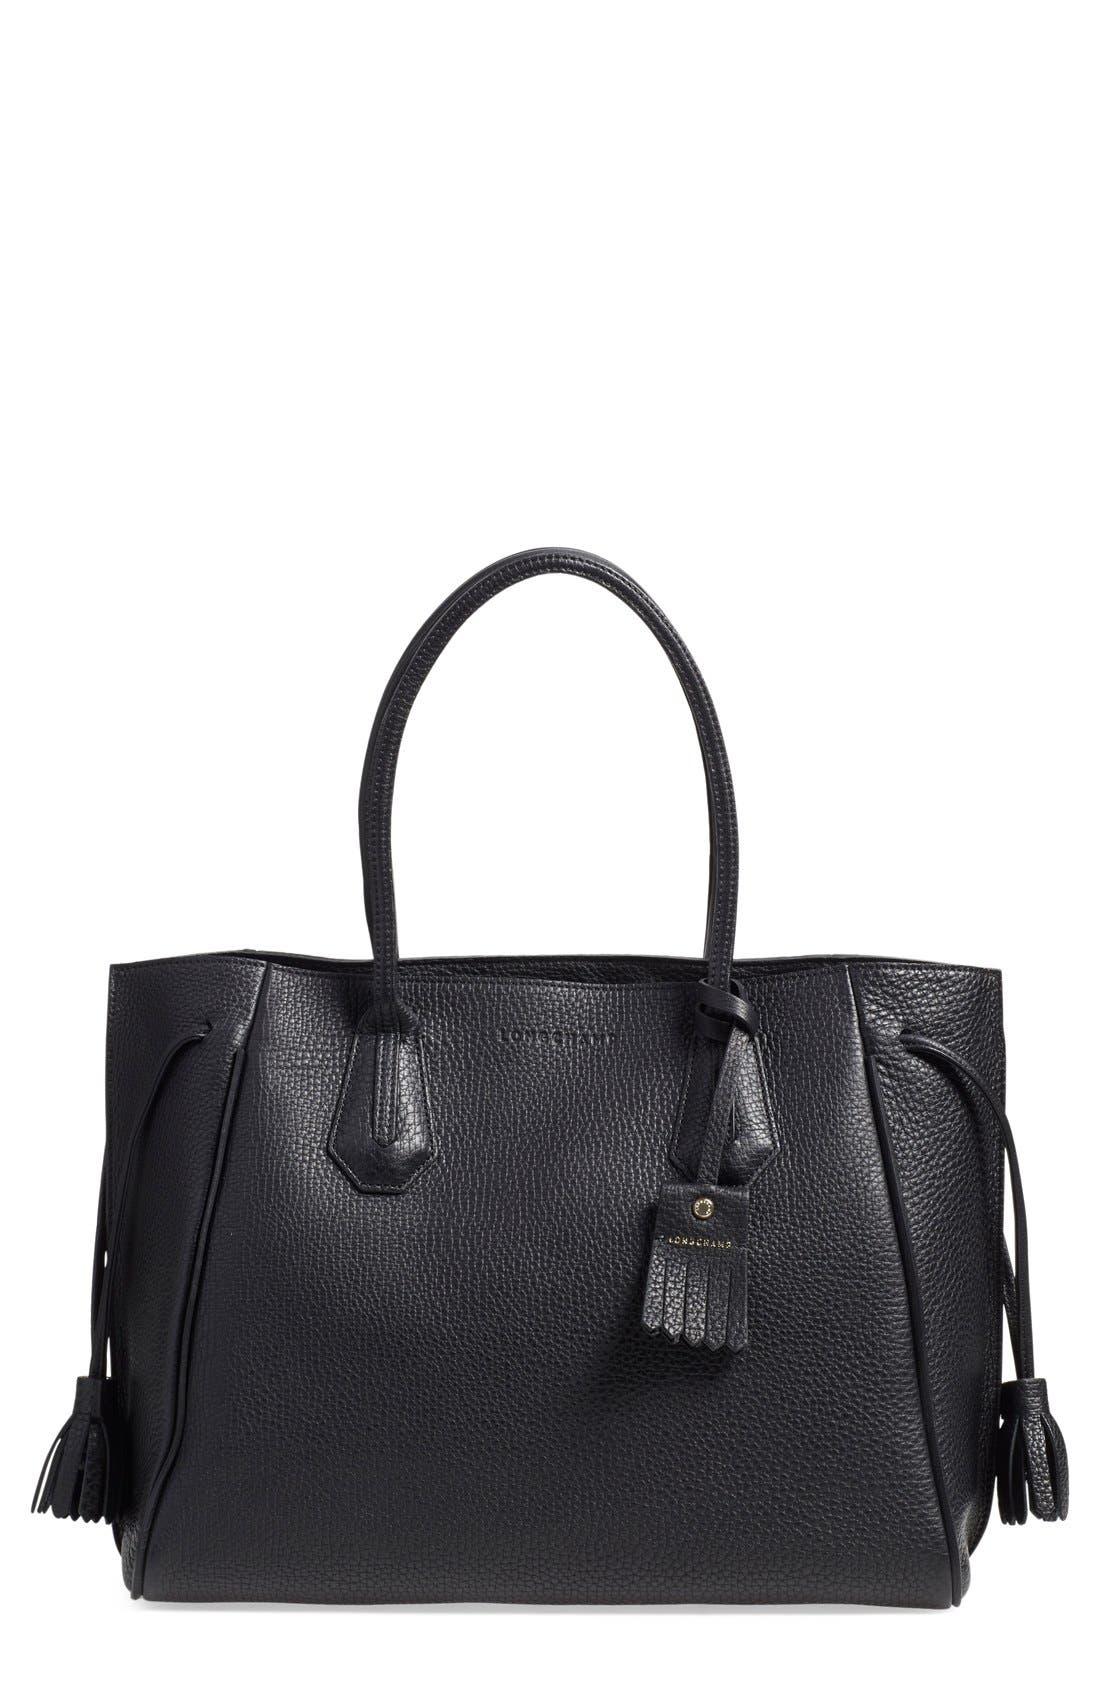 Alternate Image 1 Selected - Longchamp 'Penelope' Tassel Drawstring Leather Tote